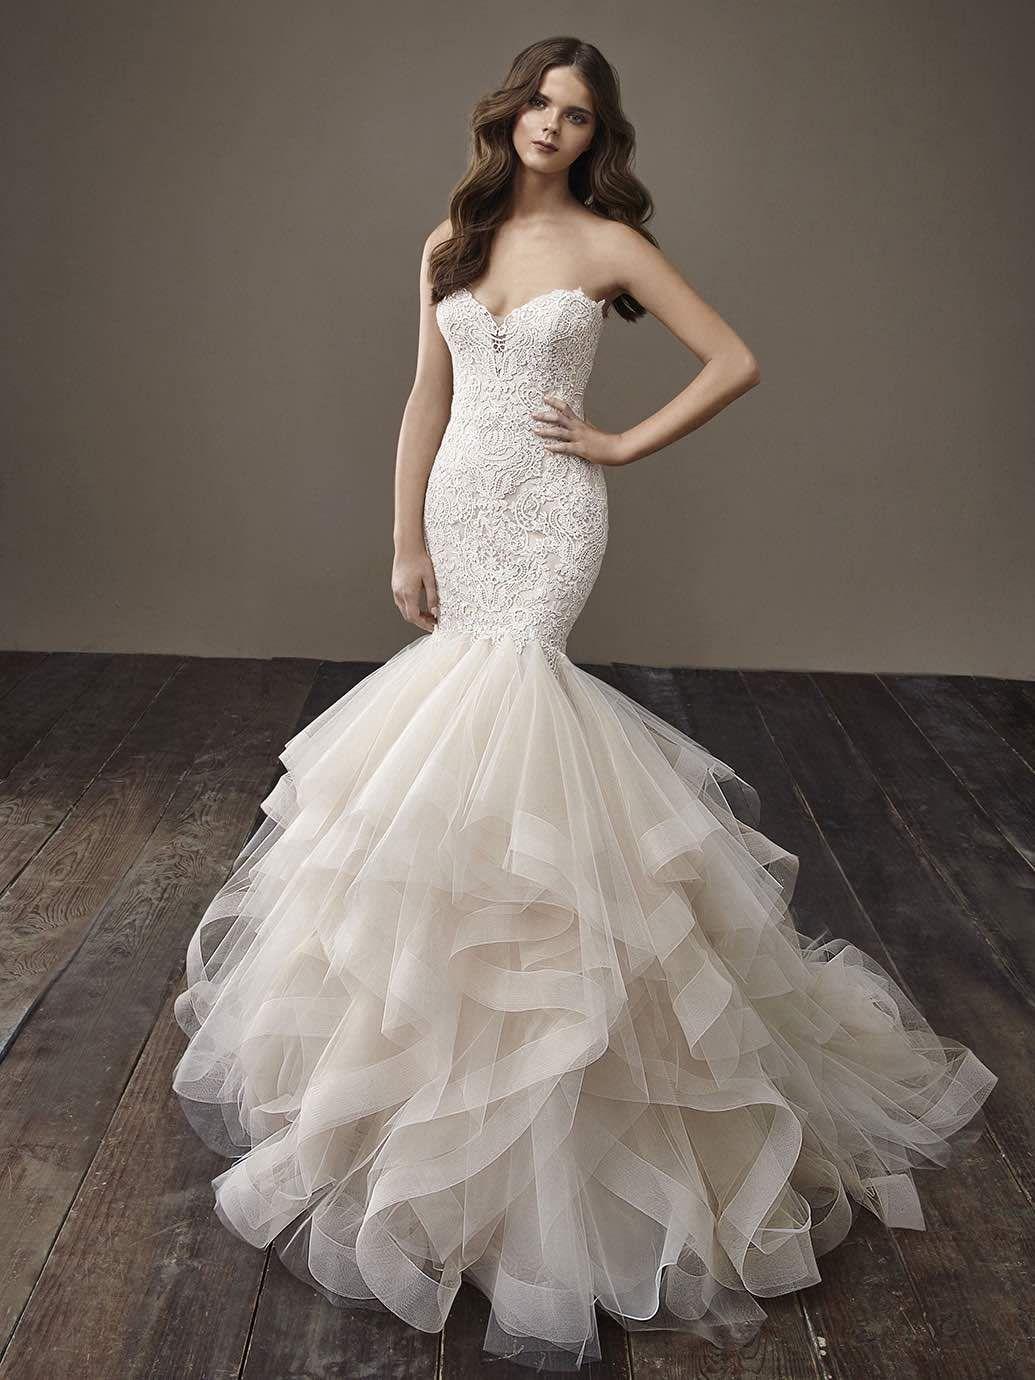 Wedding dresses fresno  Glamorously Modern Badgley Mischka Wedding Dresses Bride Collection